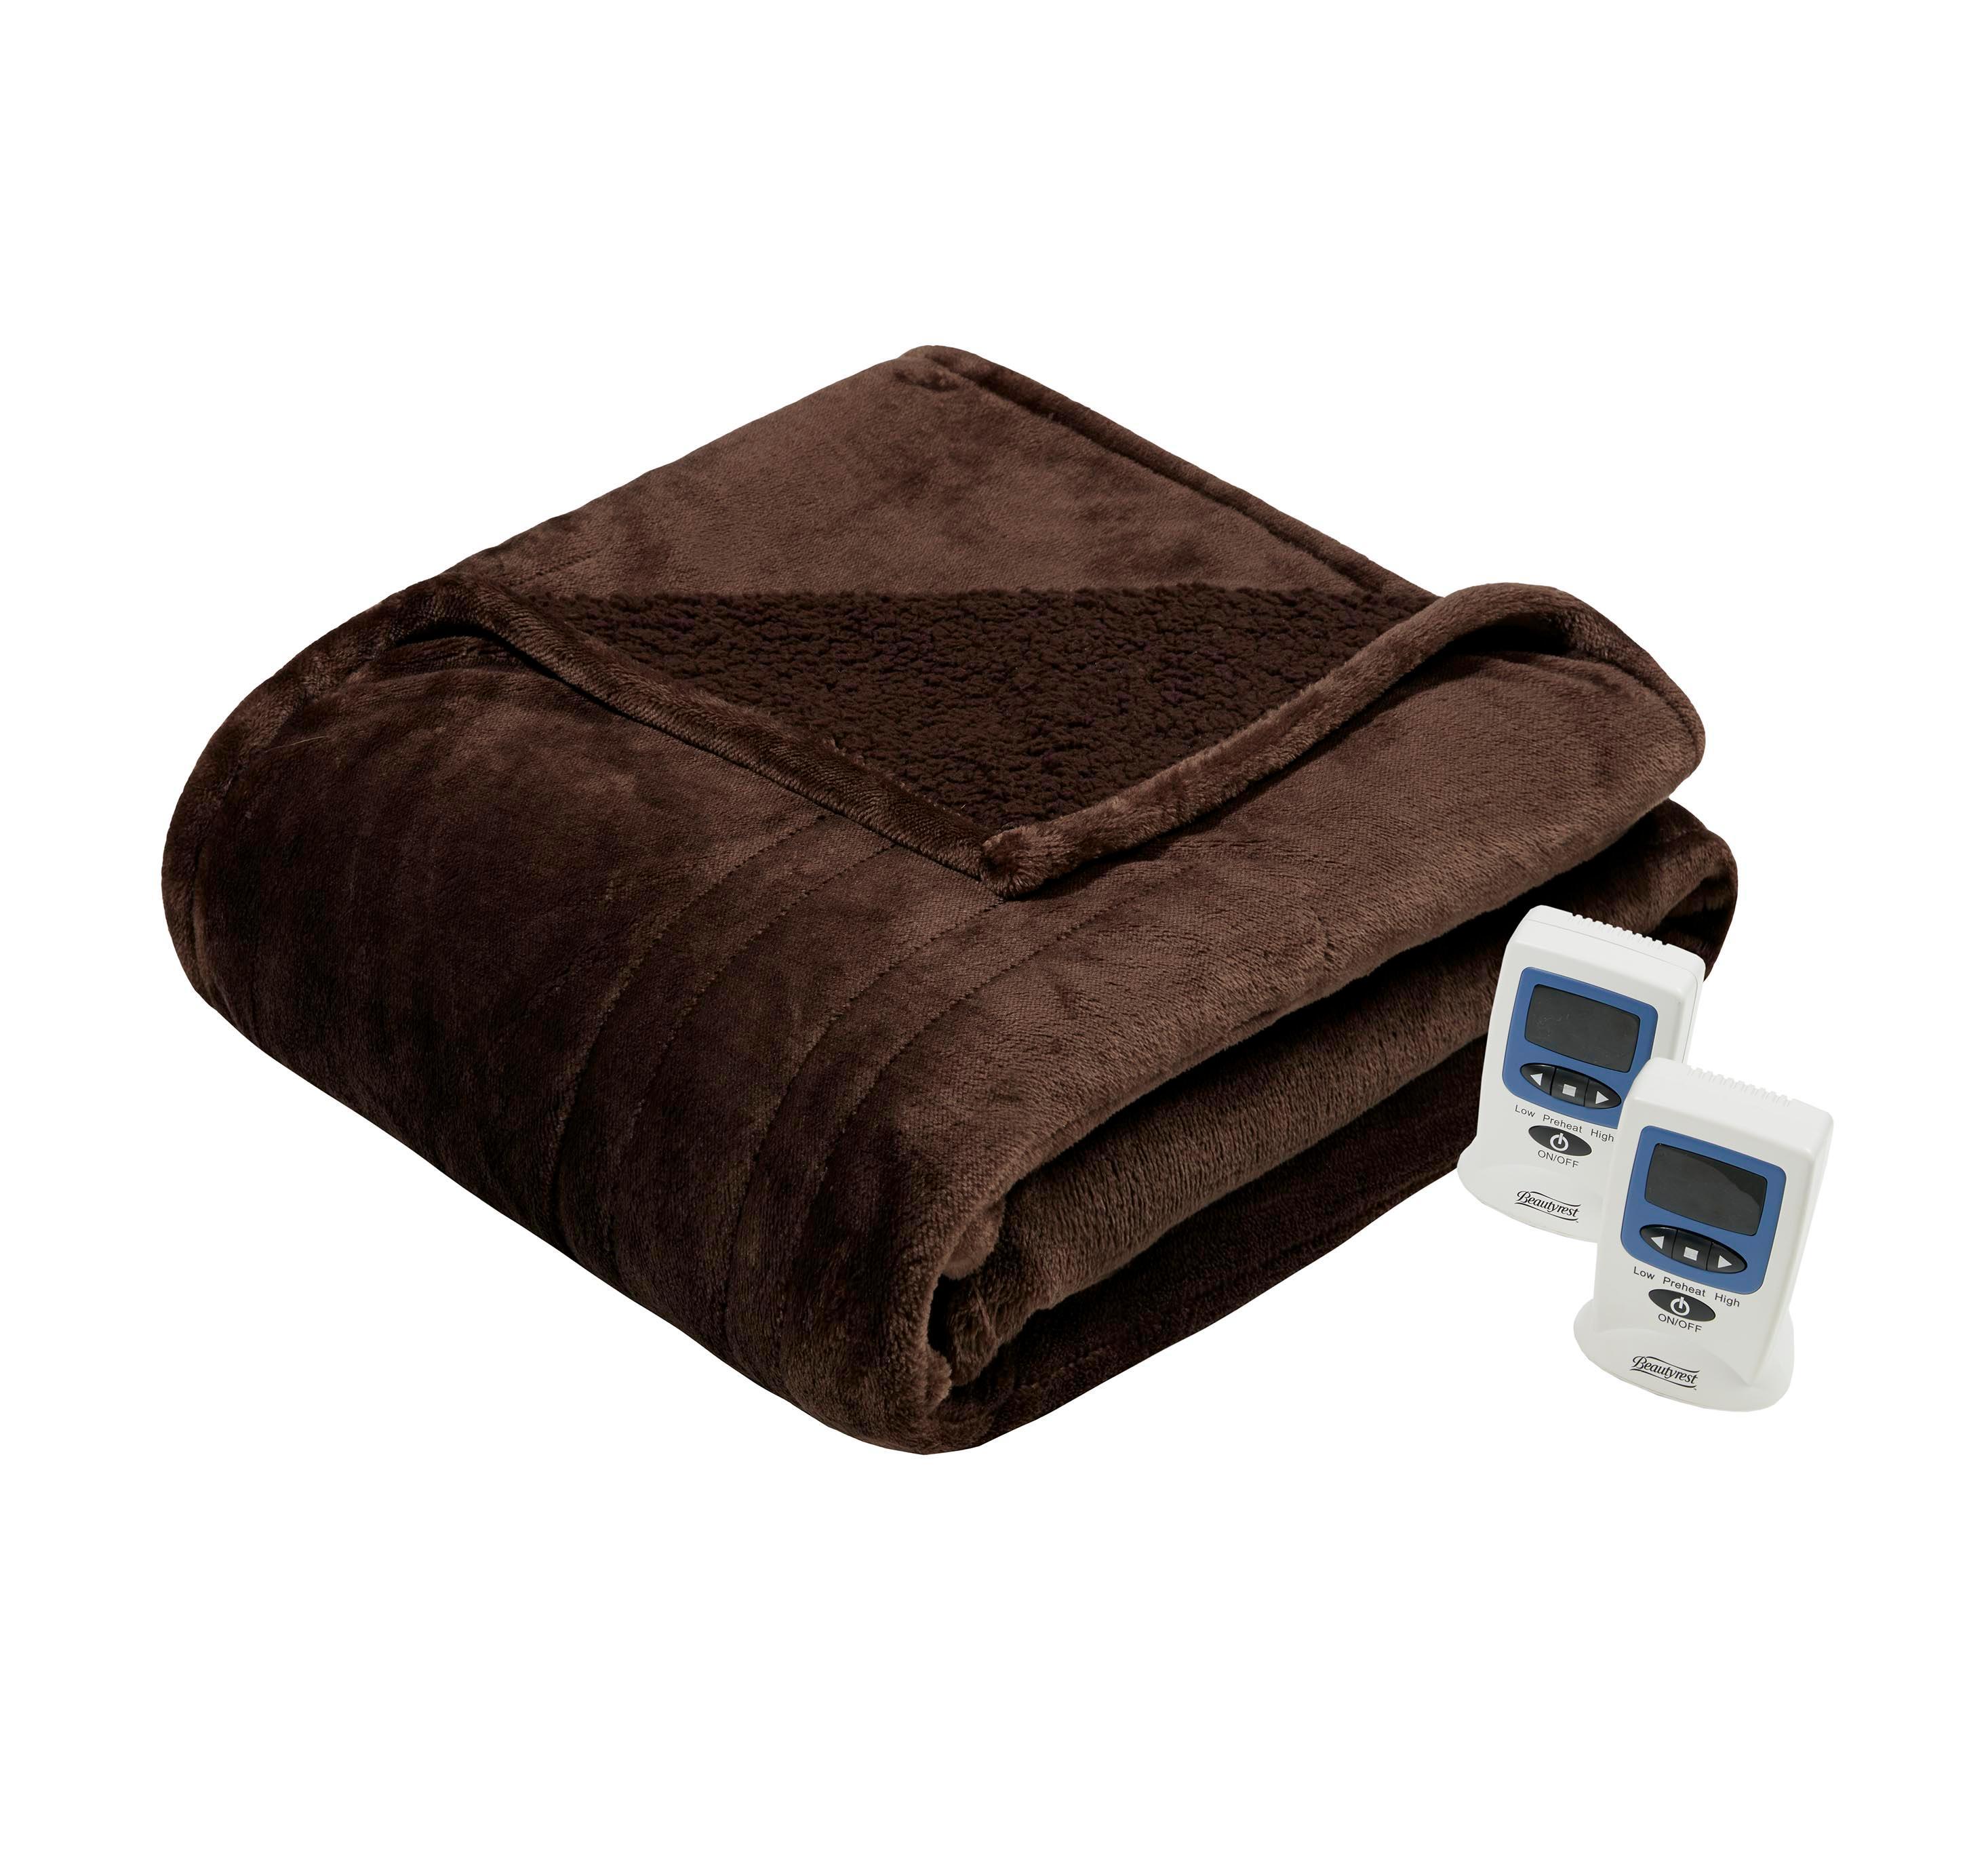 Beautyrest Solid Microlight Berber Heated Blanket Full